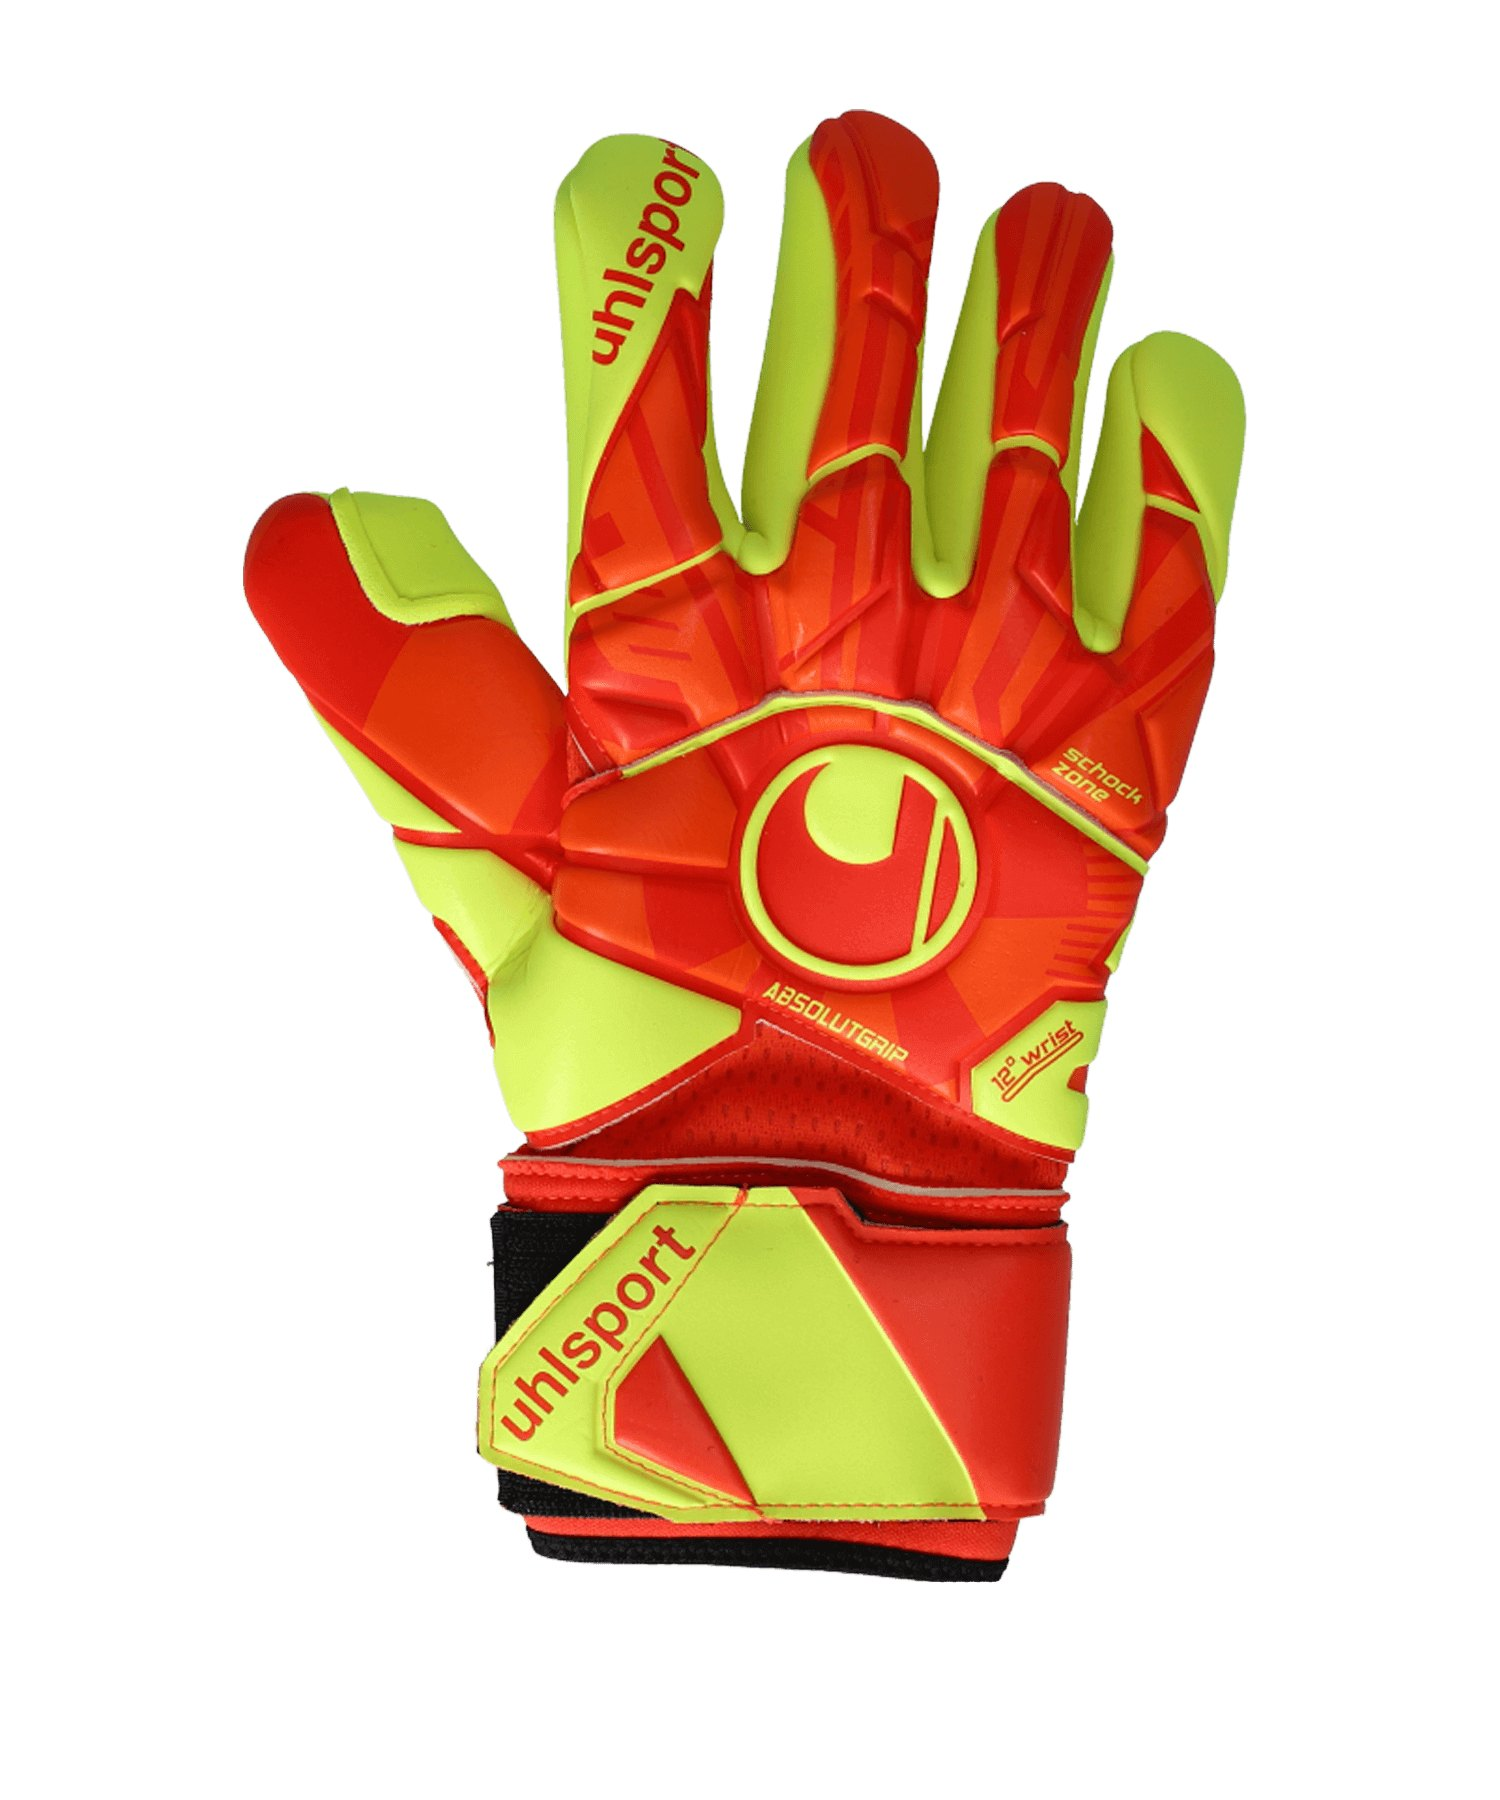 Uhlsport Dyn. Impulse Absolutgrip FS TW-Handschuh Orange F01 - orange